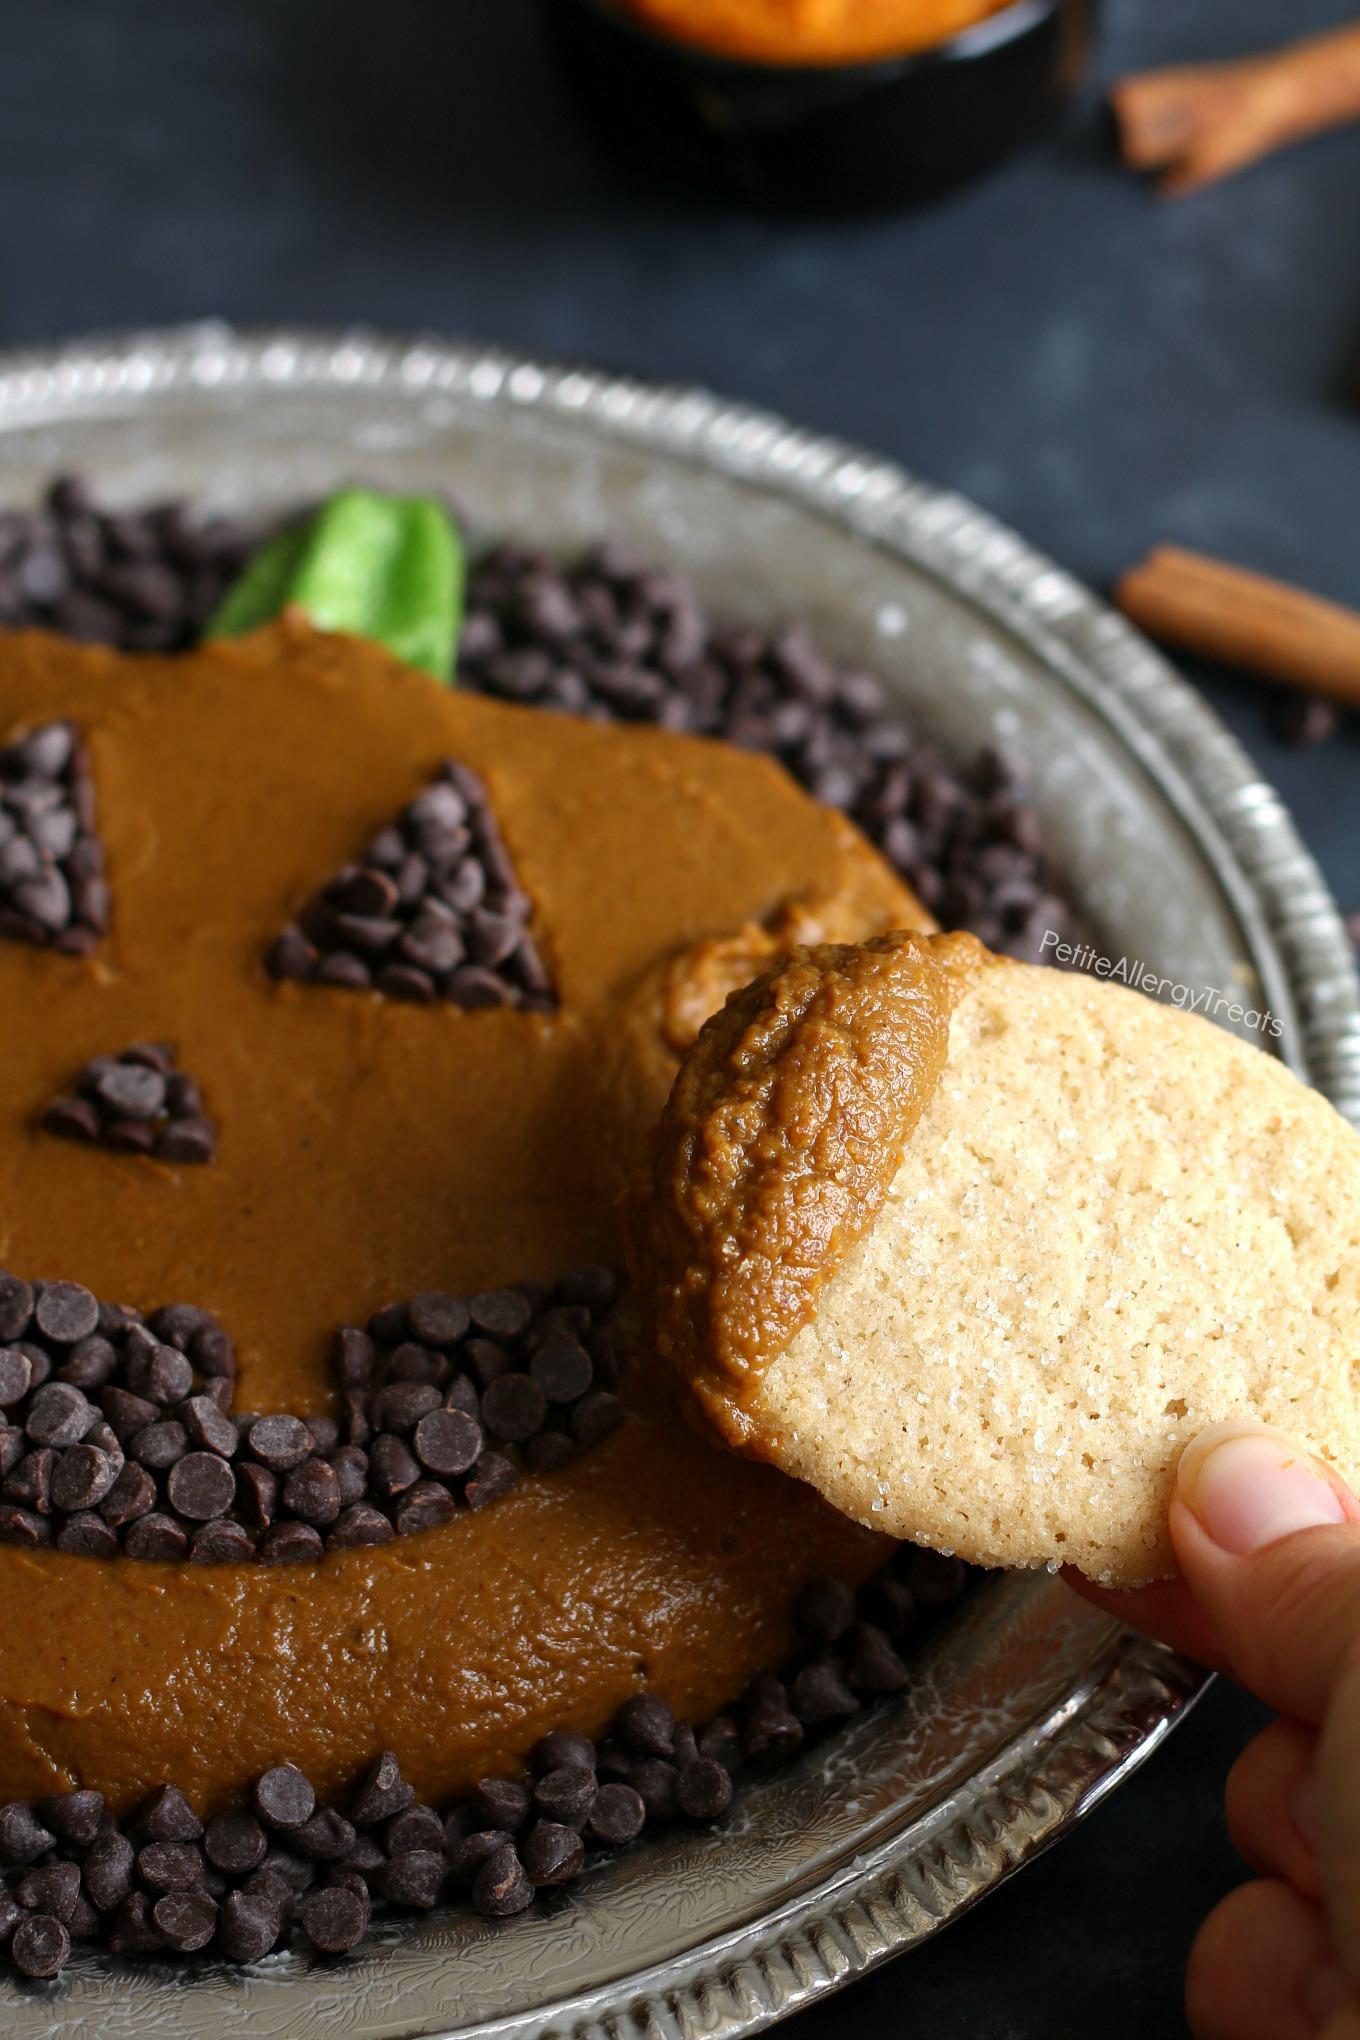 Skinny Vegan Pumpkin Pie Dip Recipe (dairy free)- Adorable pumpkin platter for Fall, Halloween or Autumn parties! Food Allergy friendly!